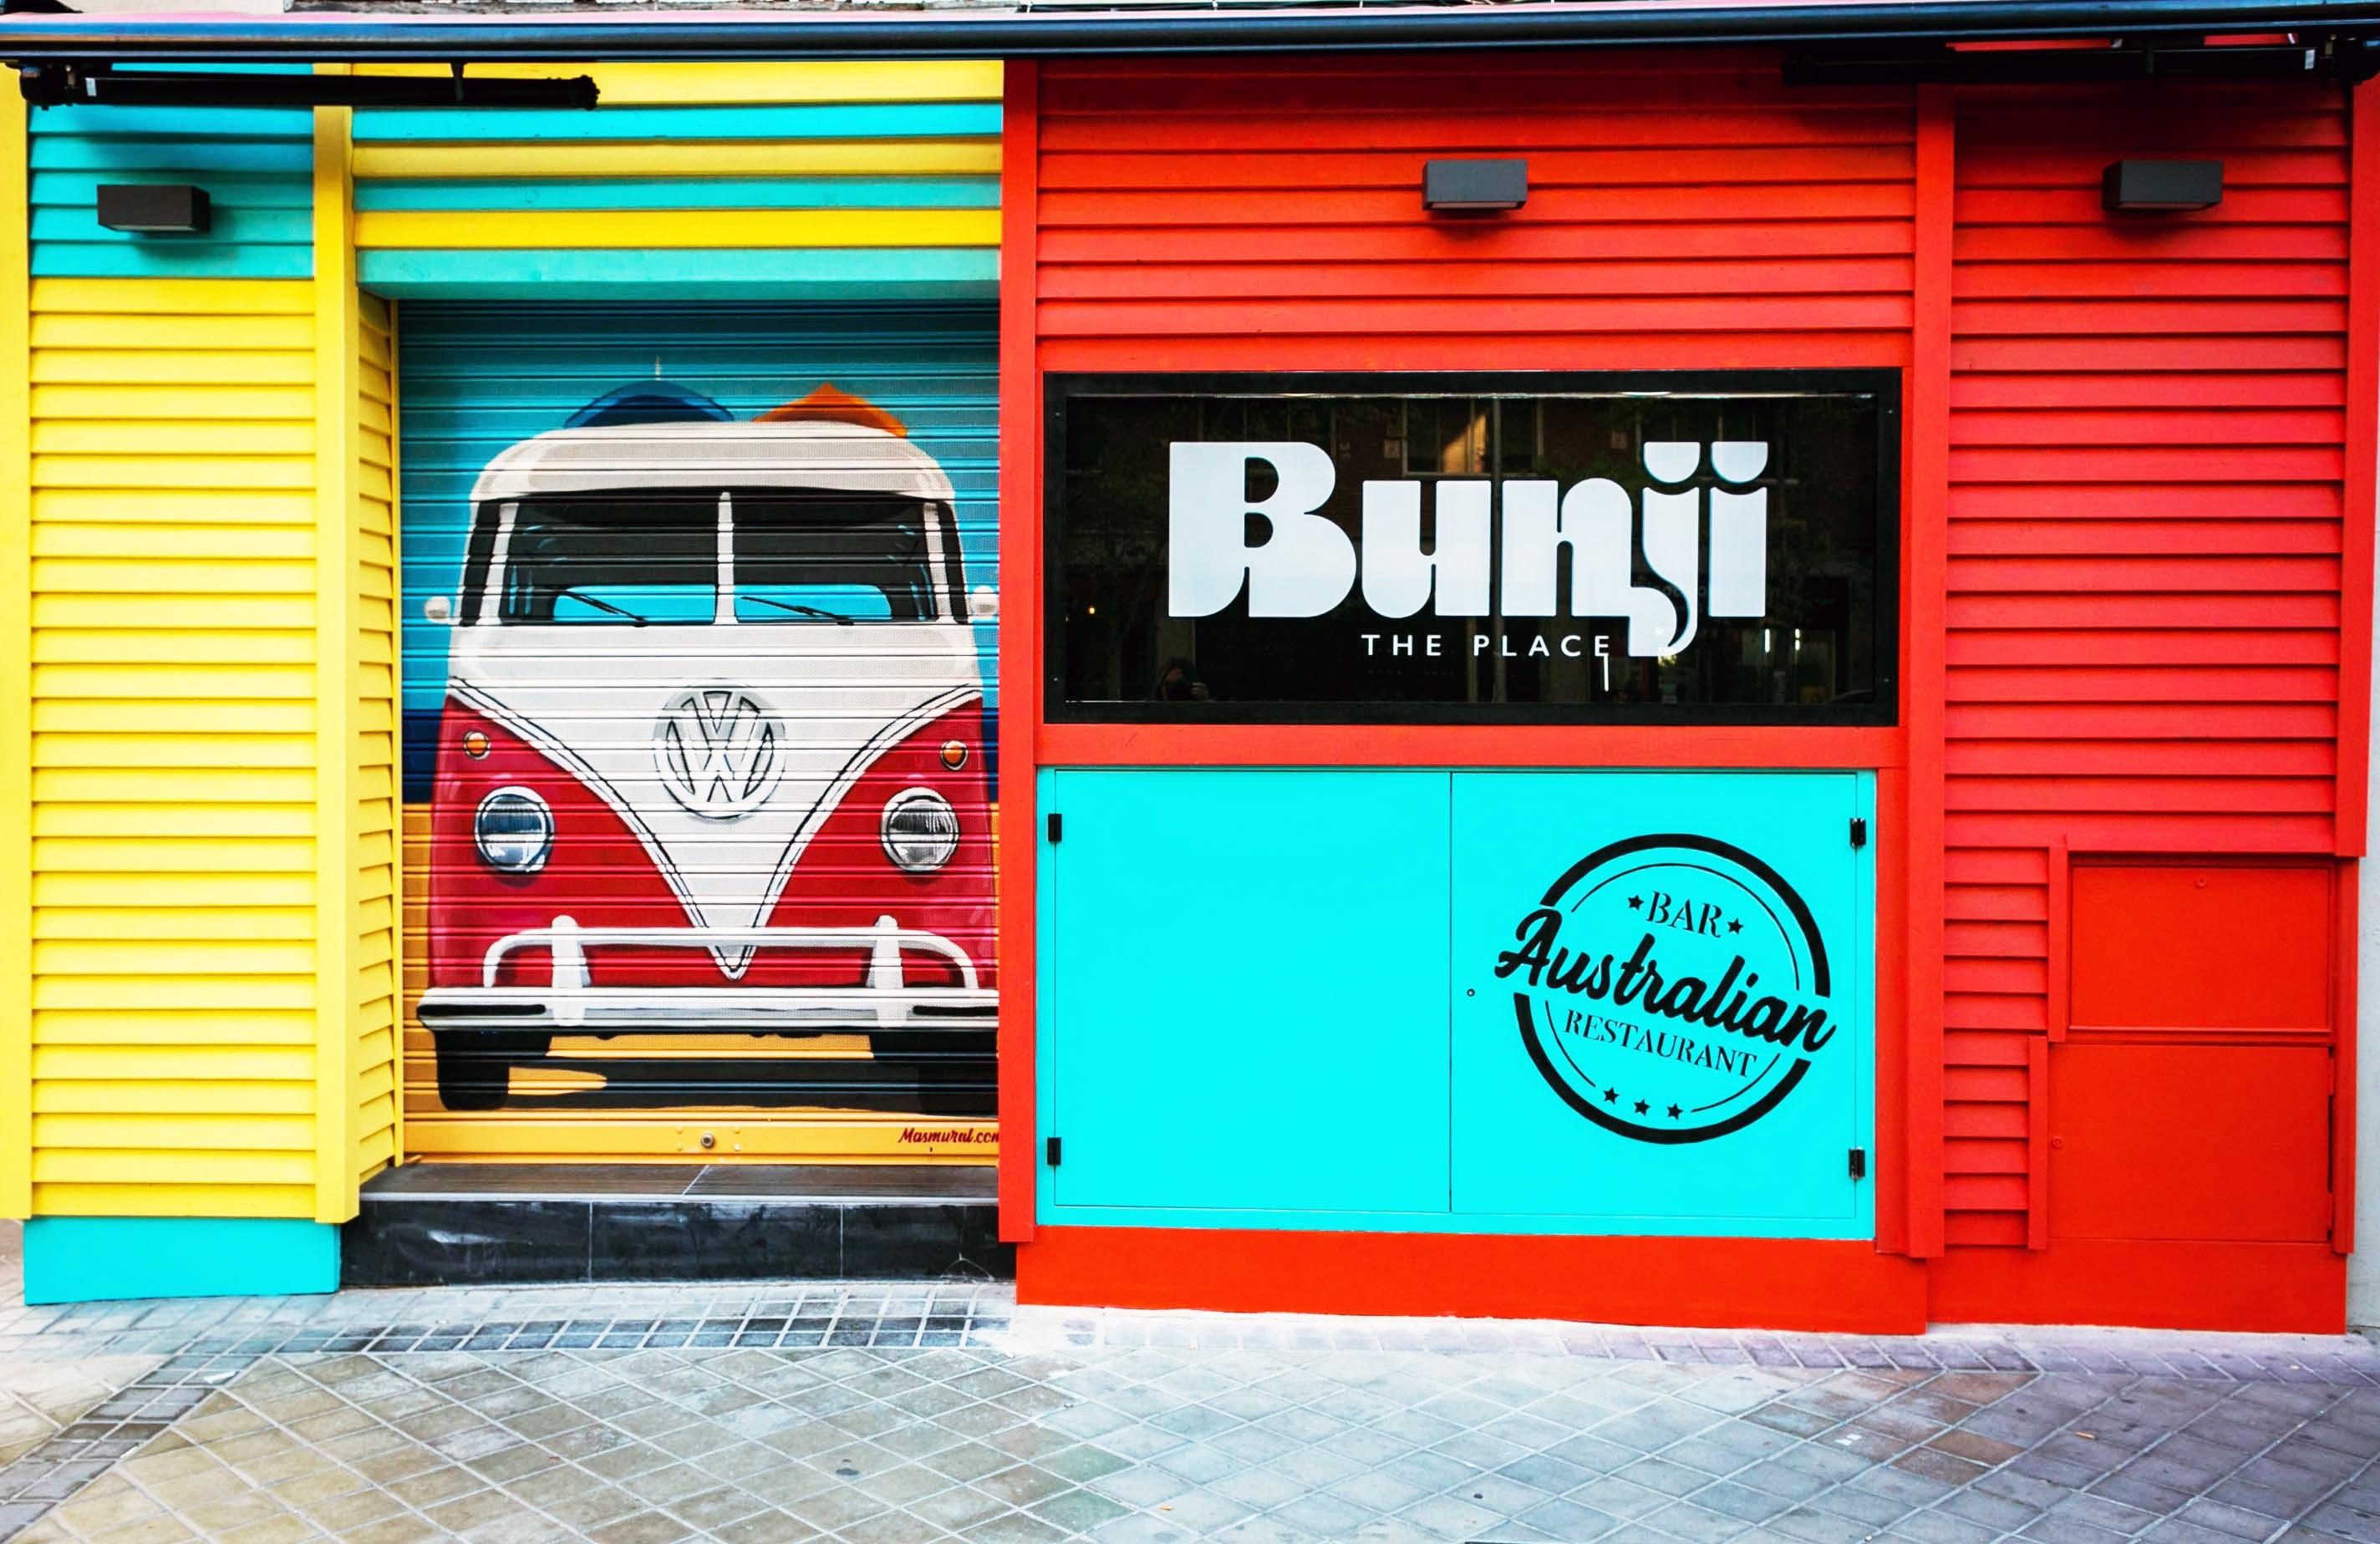 Restaurante Bunji The Place / BUNJI THE PA